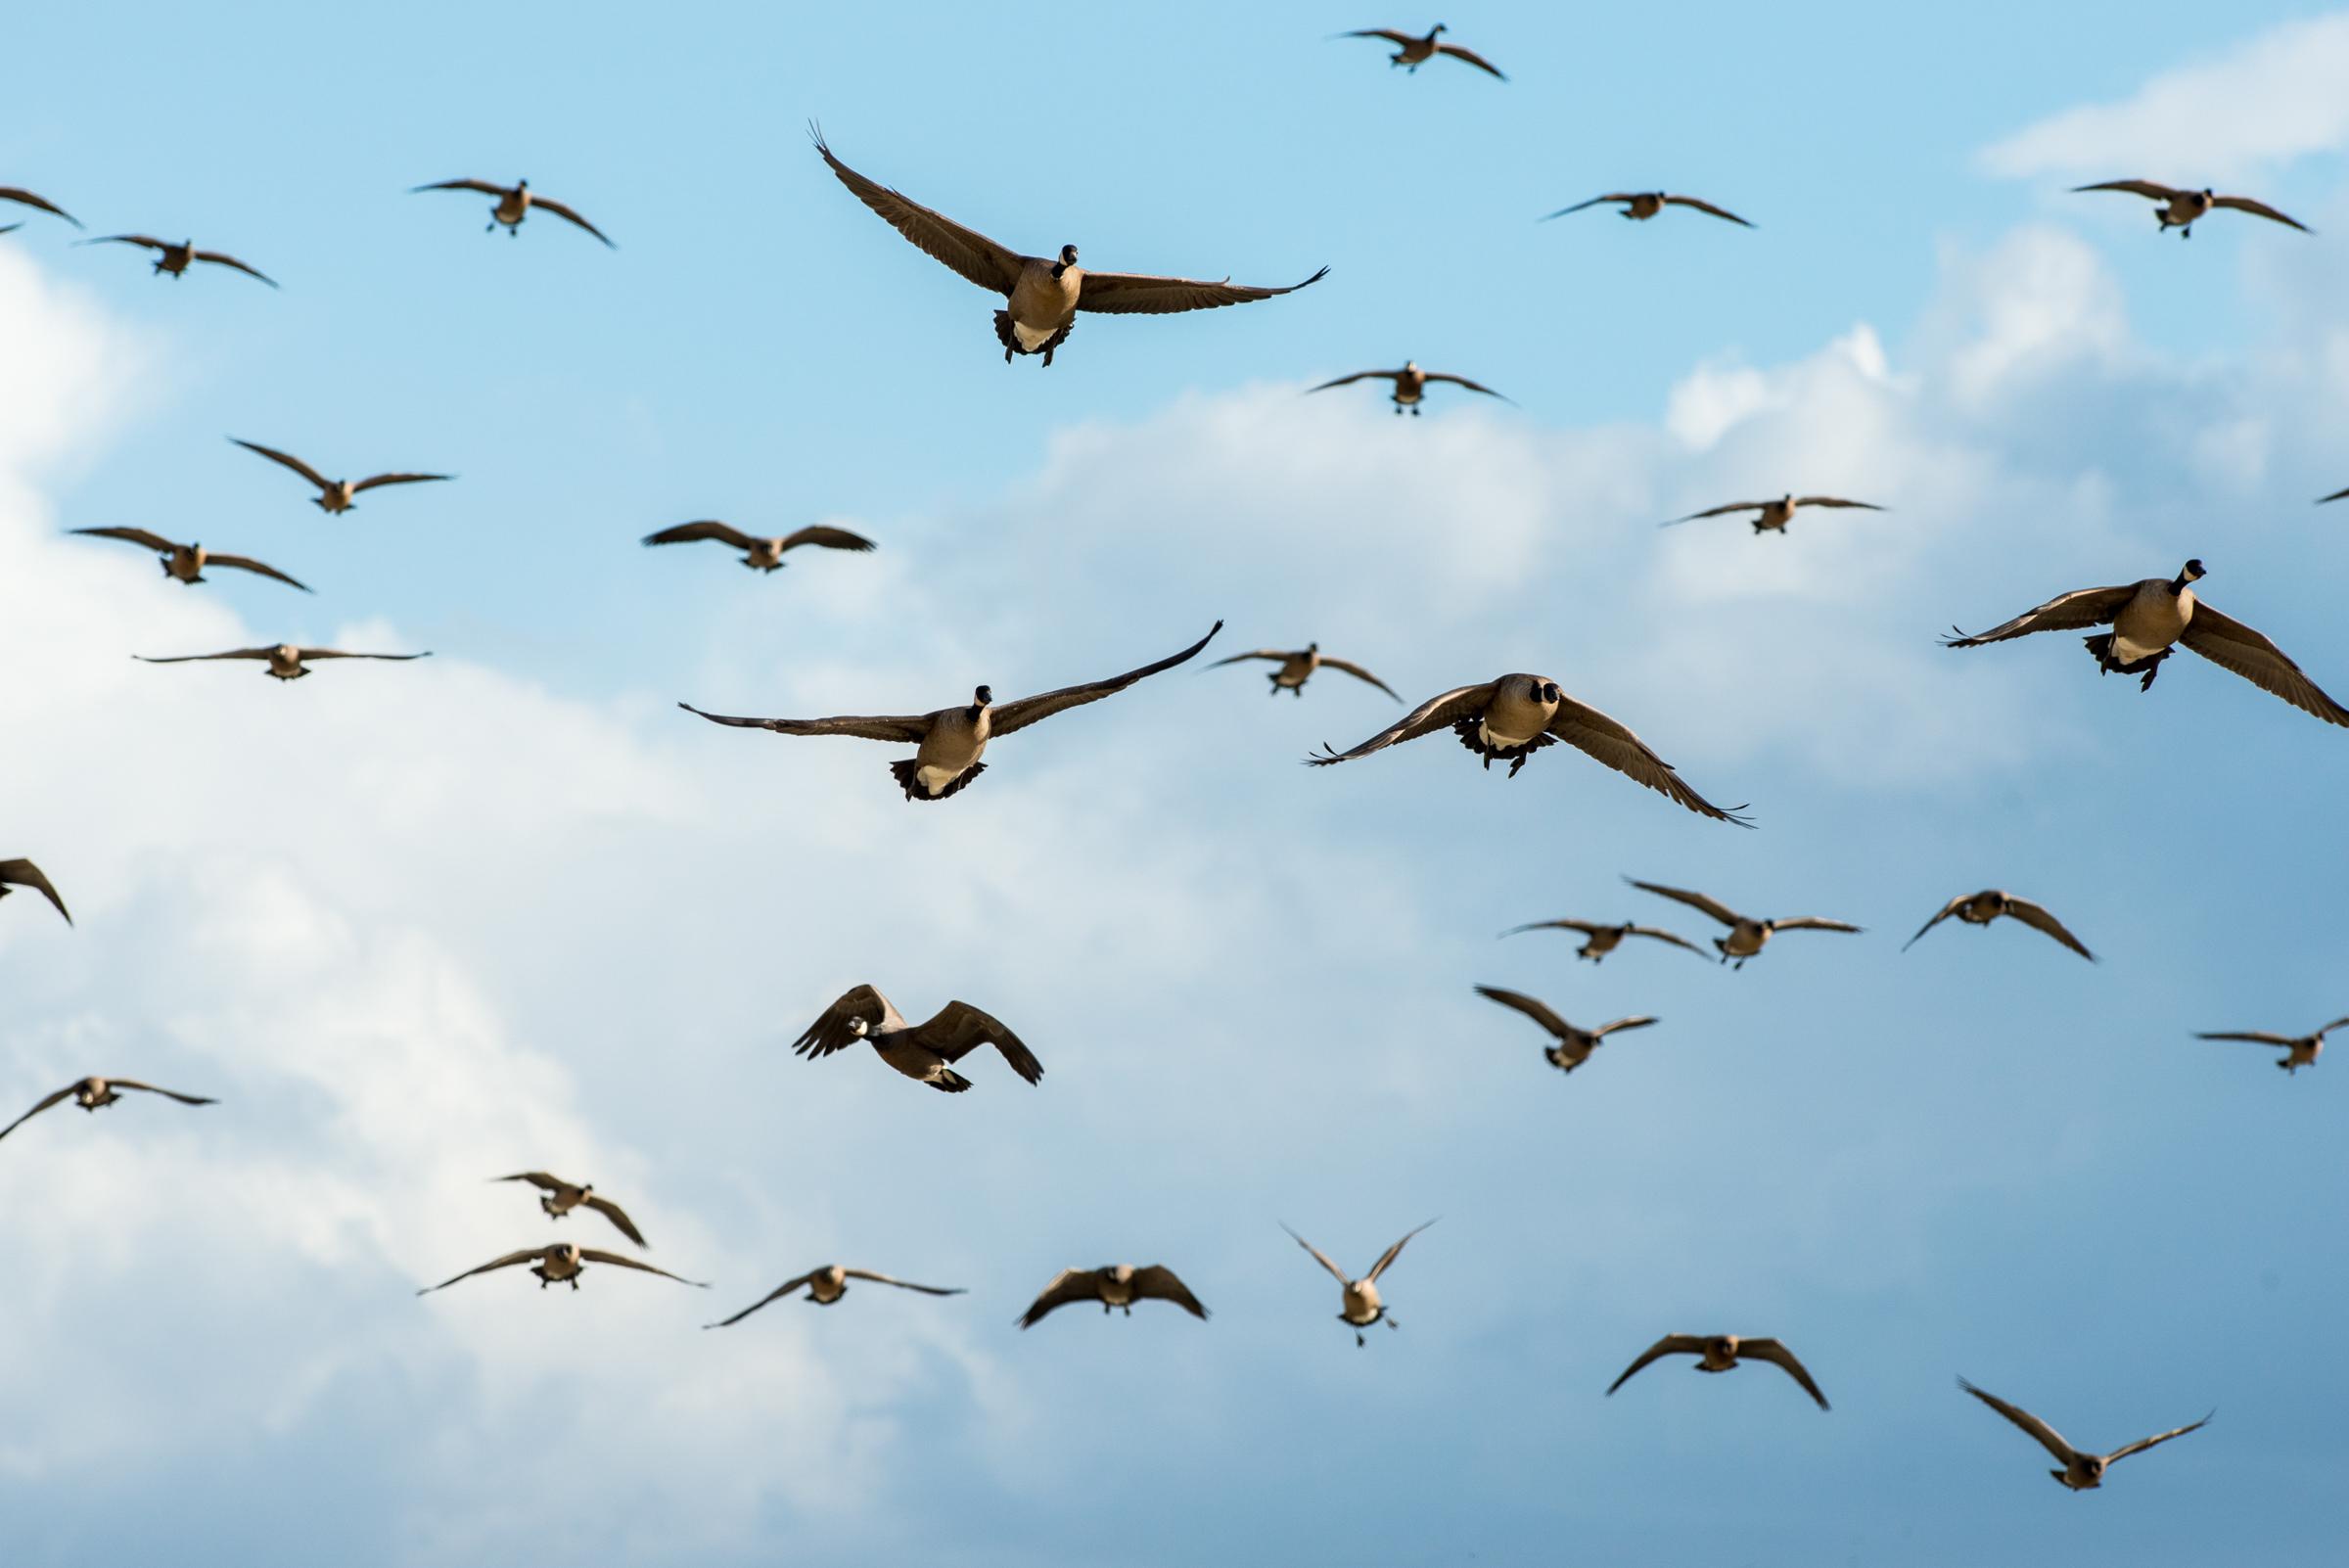 Canda Geese in Flight